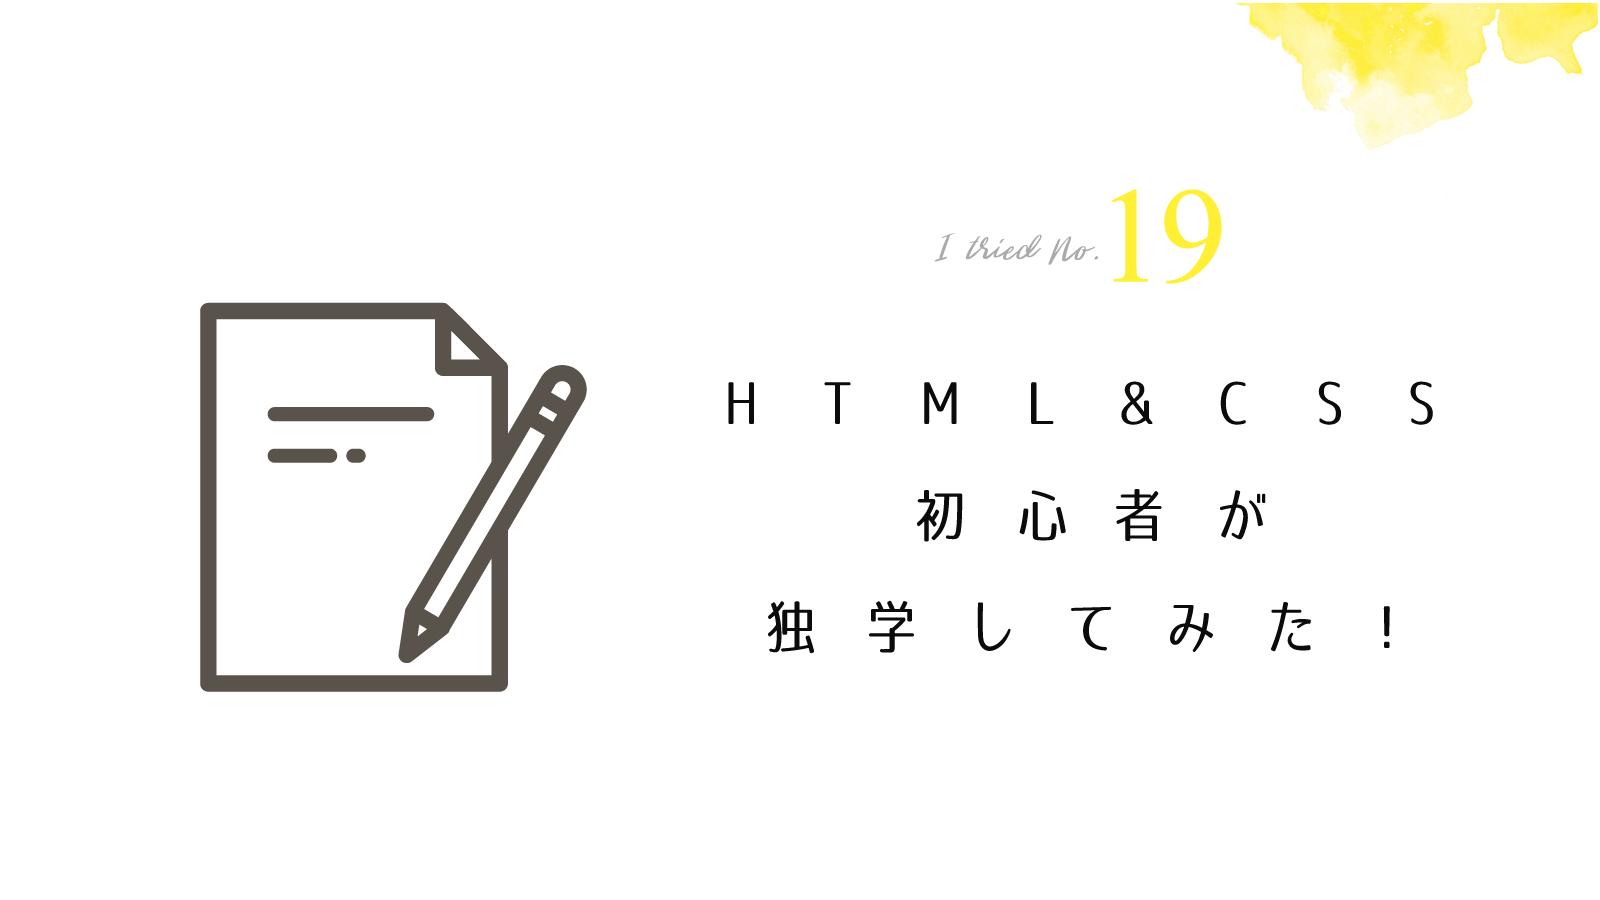 HTML CSS 独学 勉強